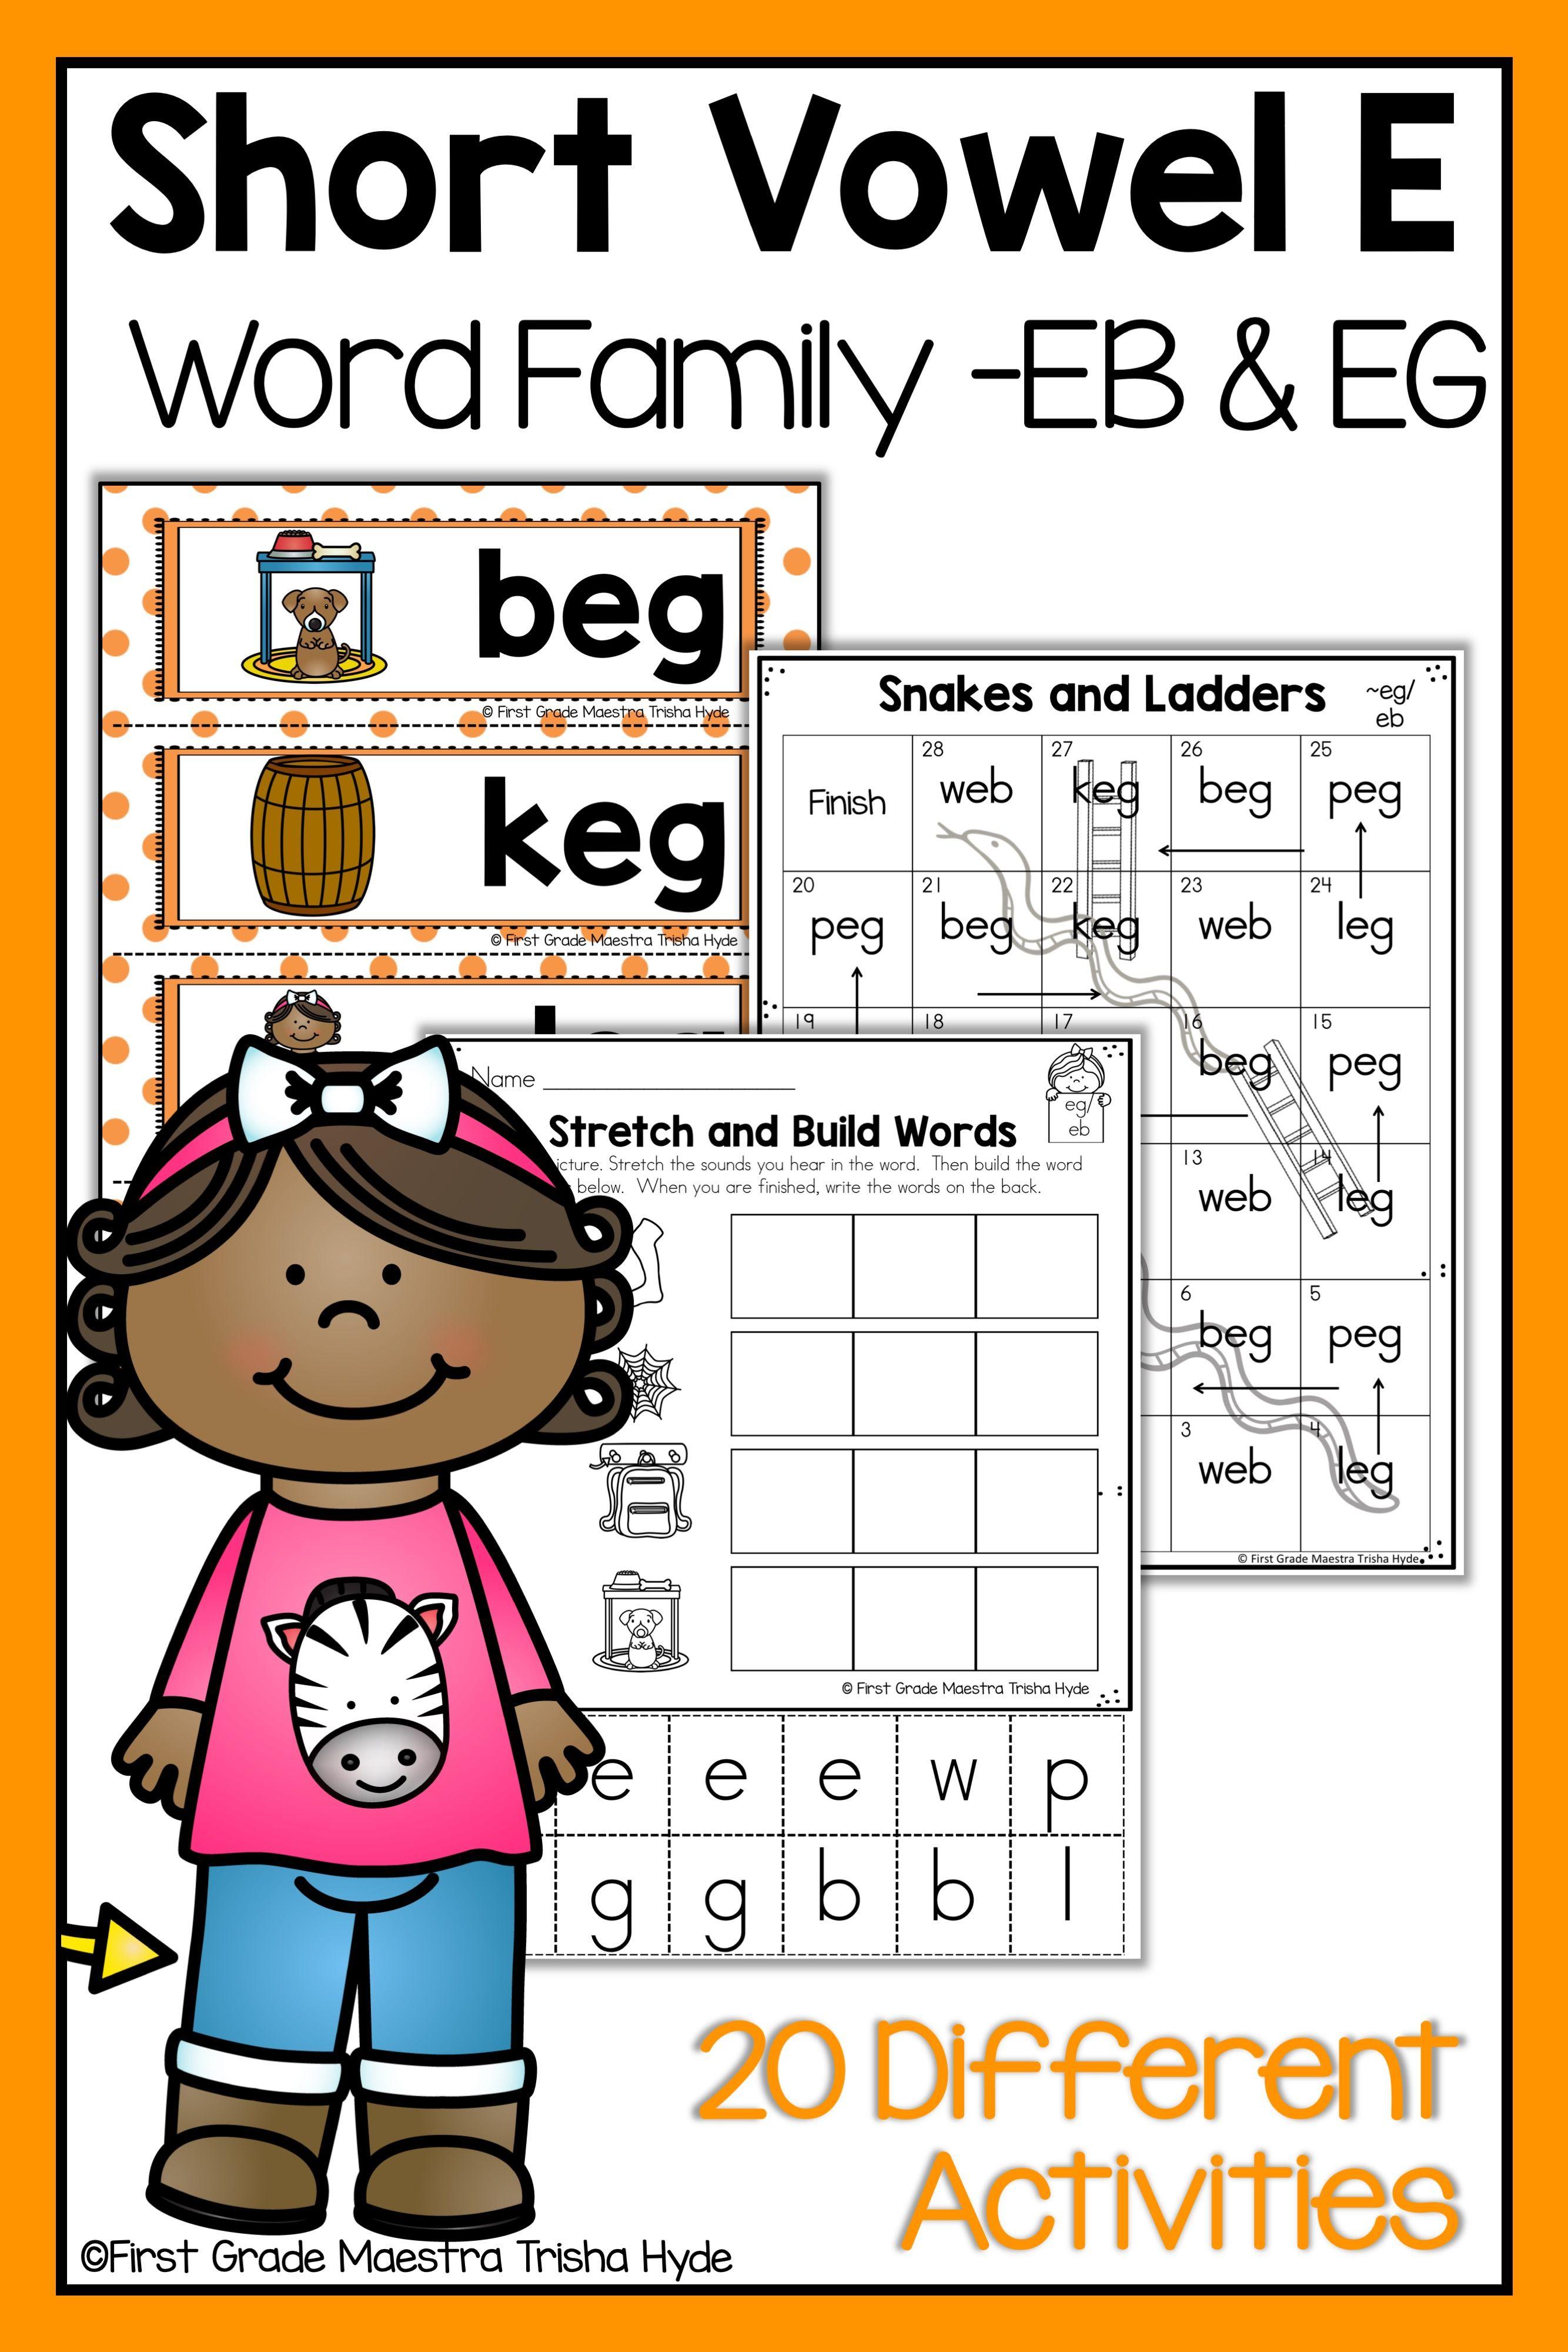 Short Vowel E Word Family Eb Eg Word Families Ccvc Words Words [ 4000 x 2667 Pixel ]